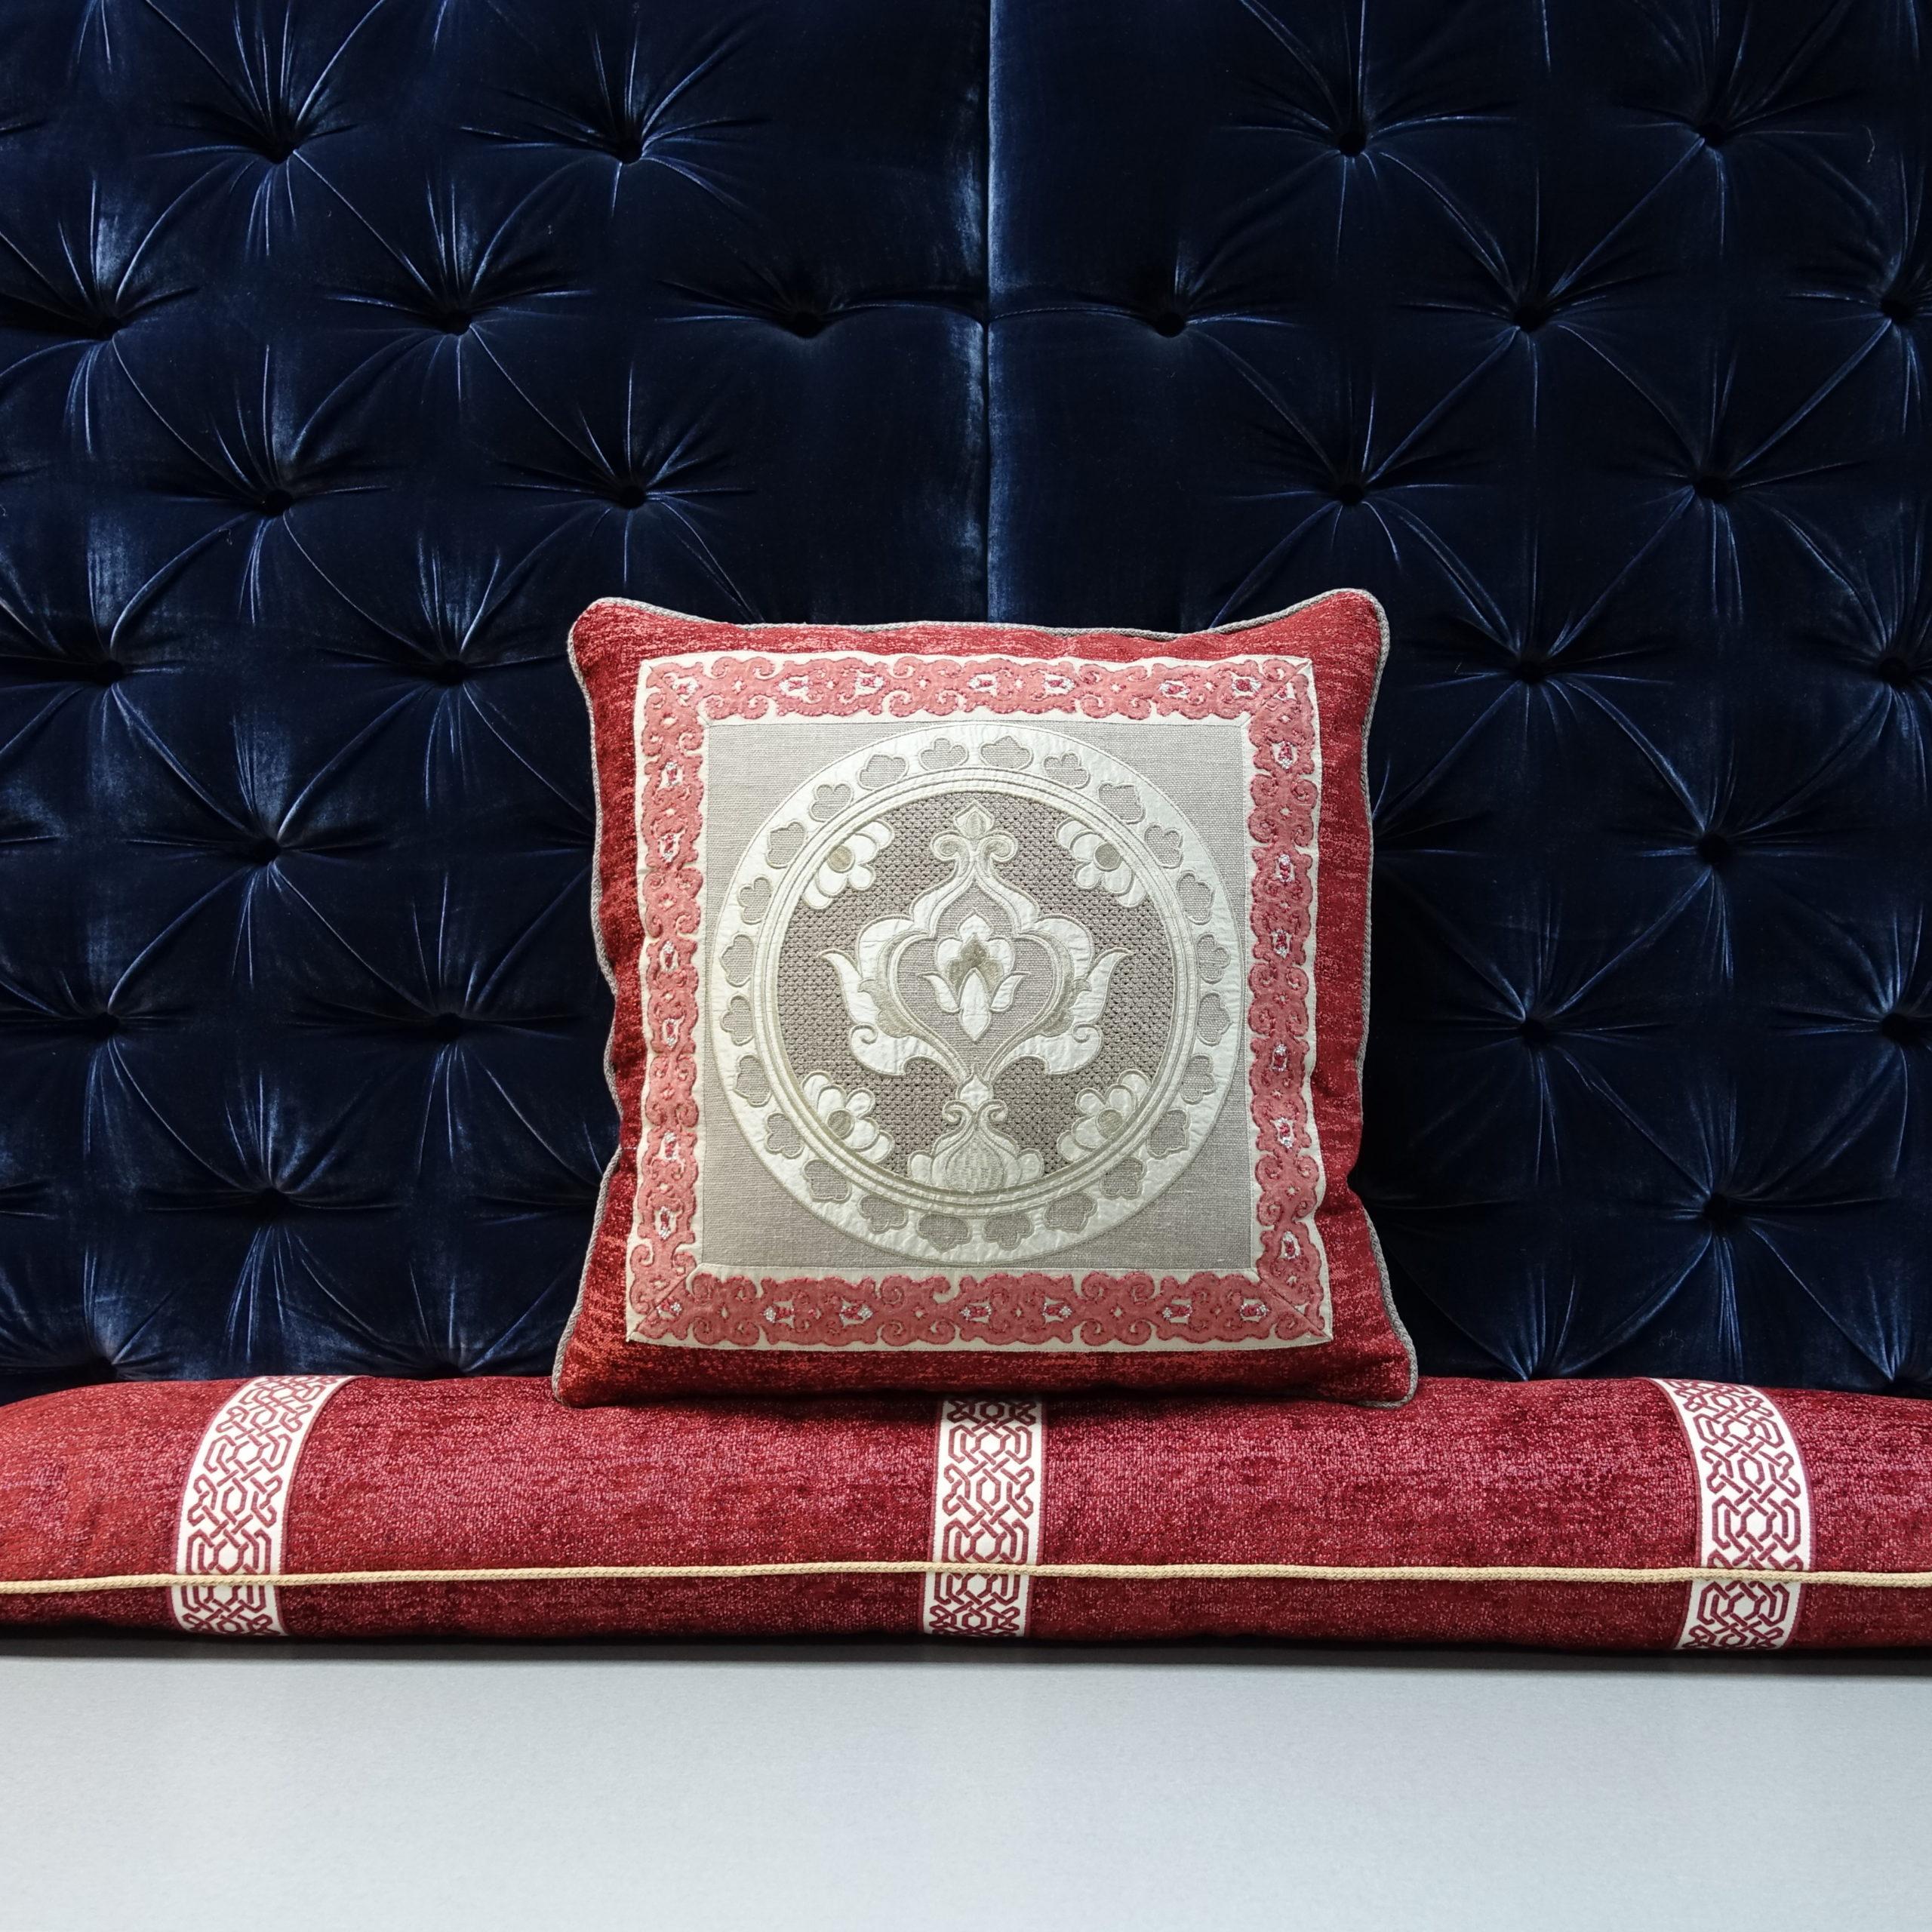 Пошив подушек для дивана